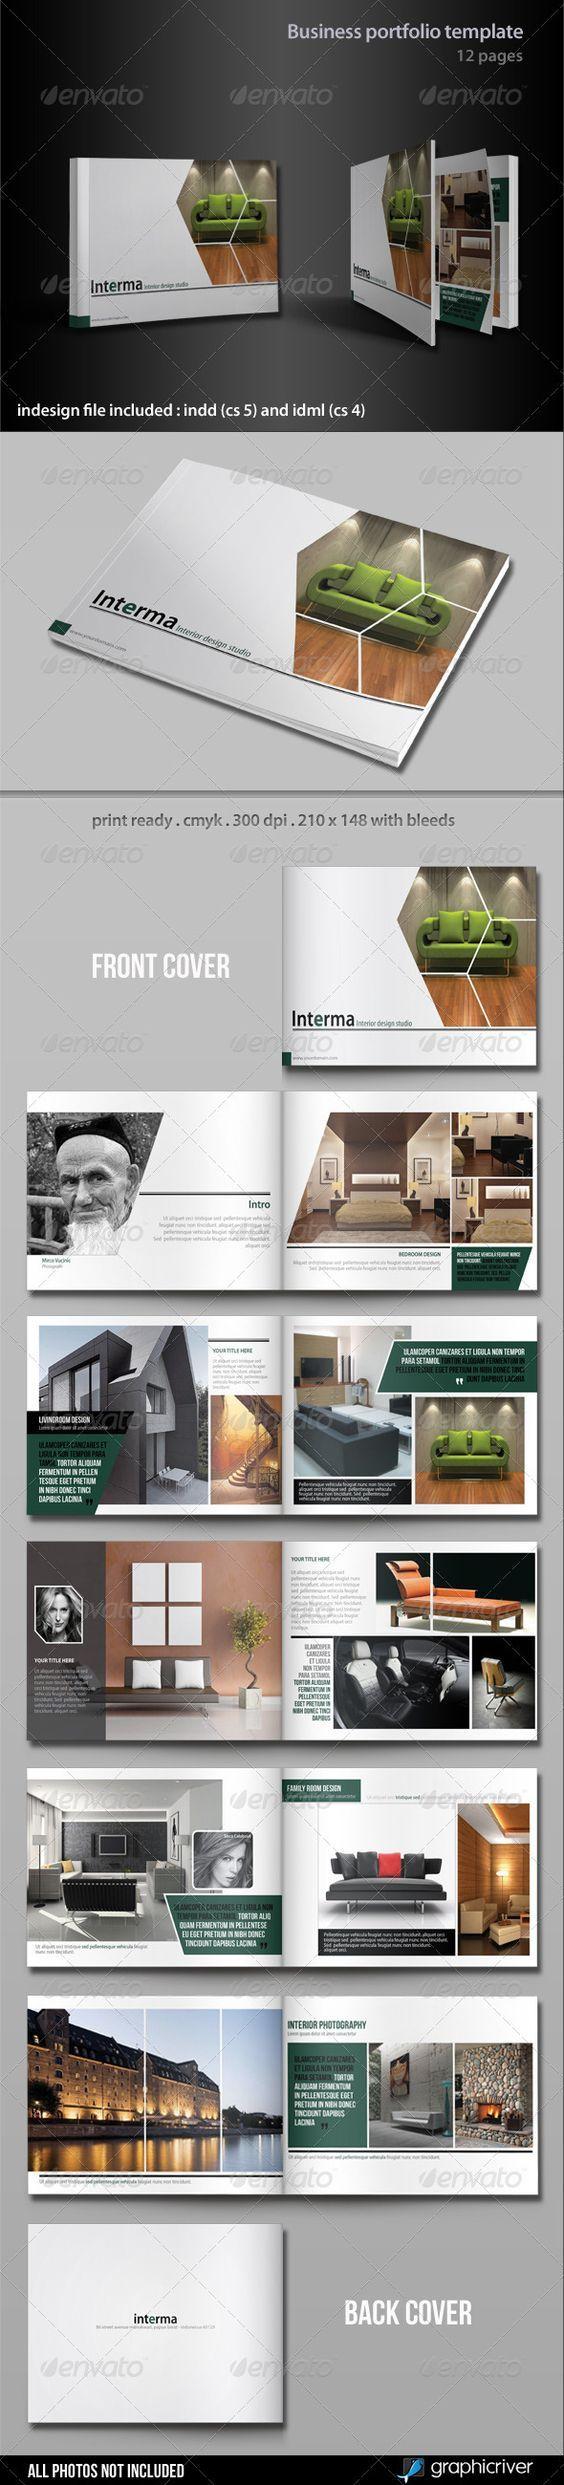 Print Templates - Business Portfolio Template   GraphicRiver: